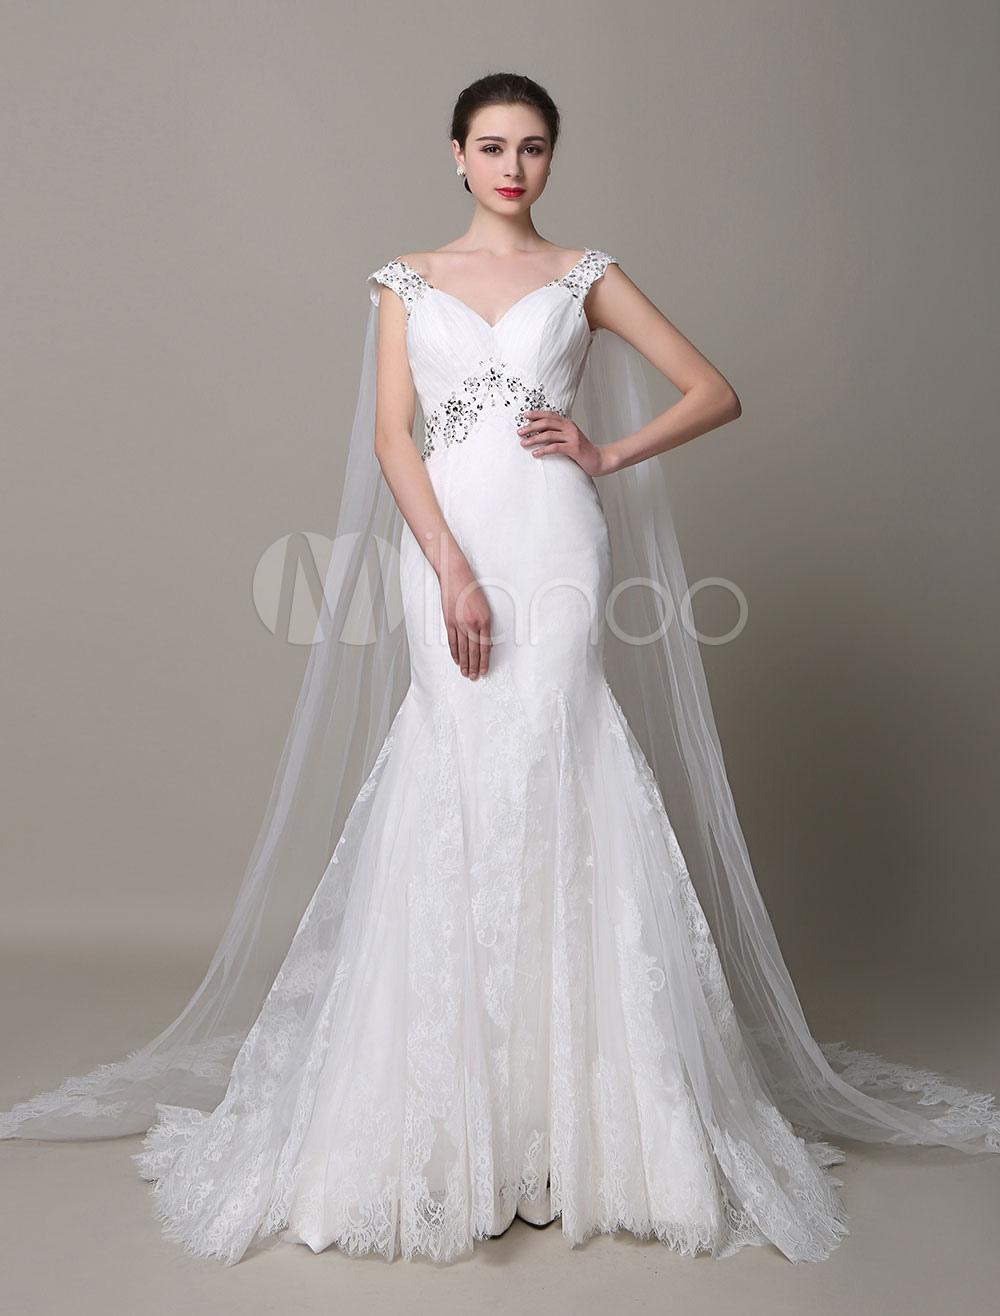 Ivory Wedding Dress Mermaid With Straps Backless Rhinestone Detachable Shawl